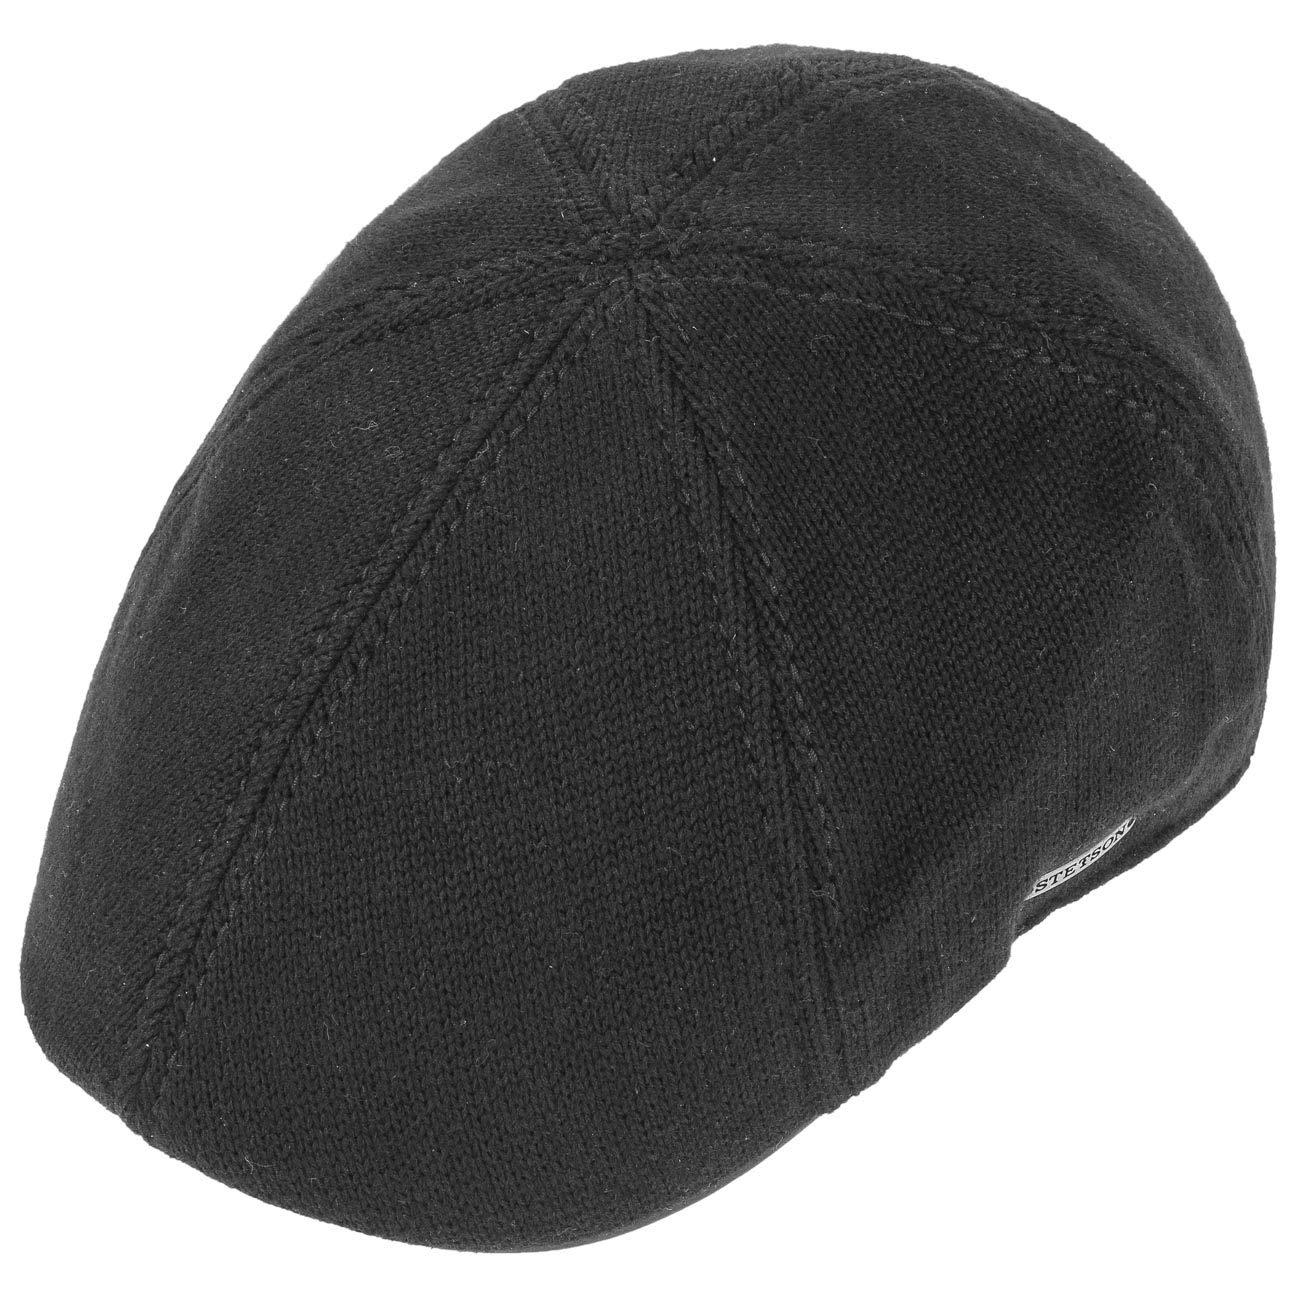 6a061045057 Stetson Muskegon Gatsby Cap ivy hat flat  Amazon.co.uk  Clothing